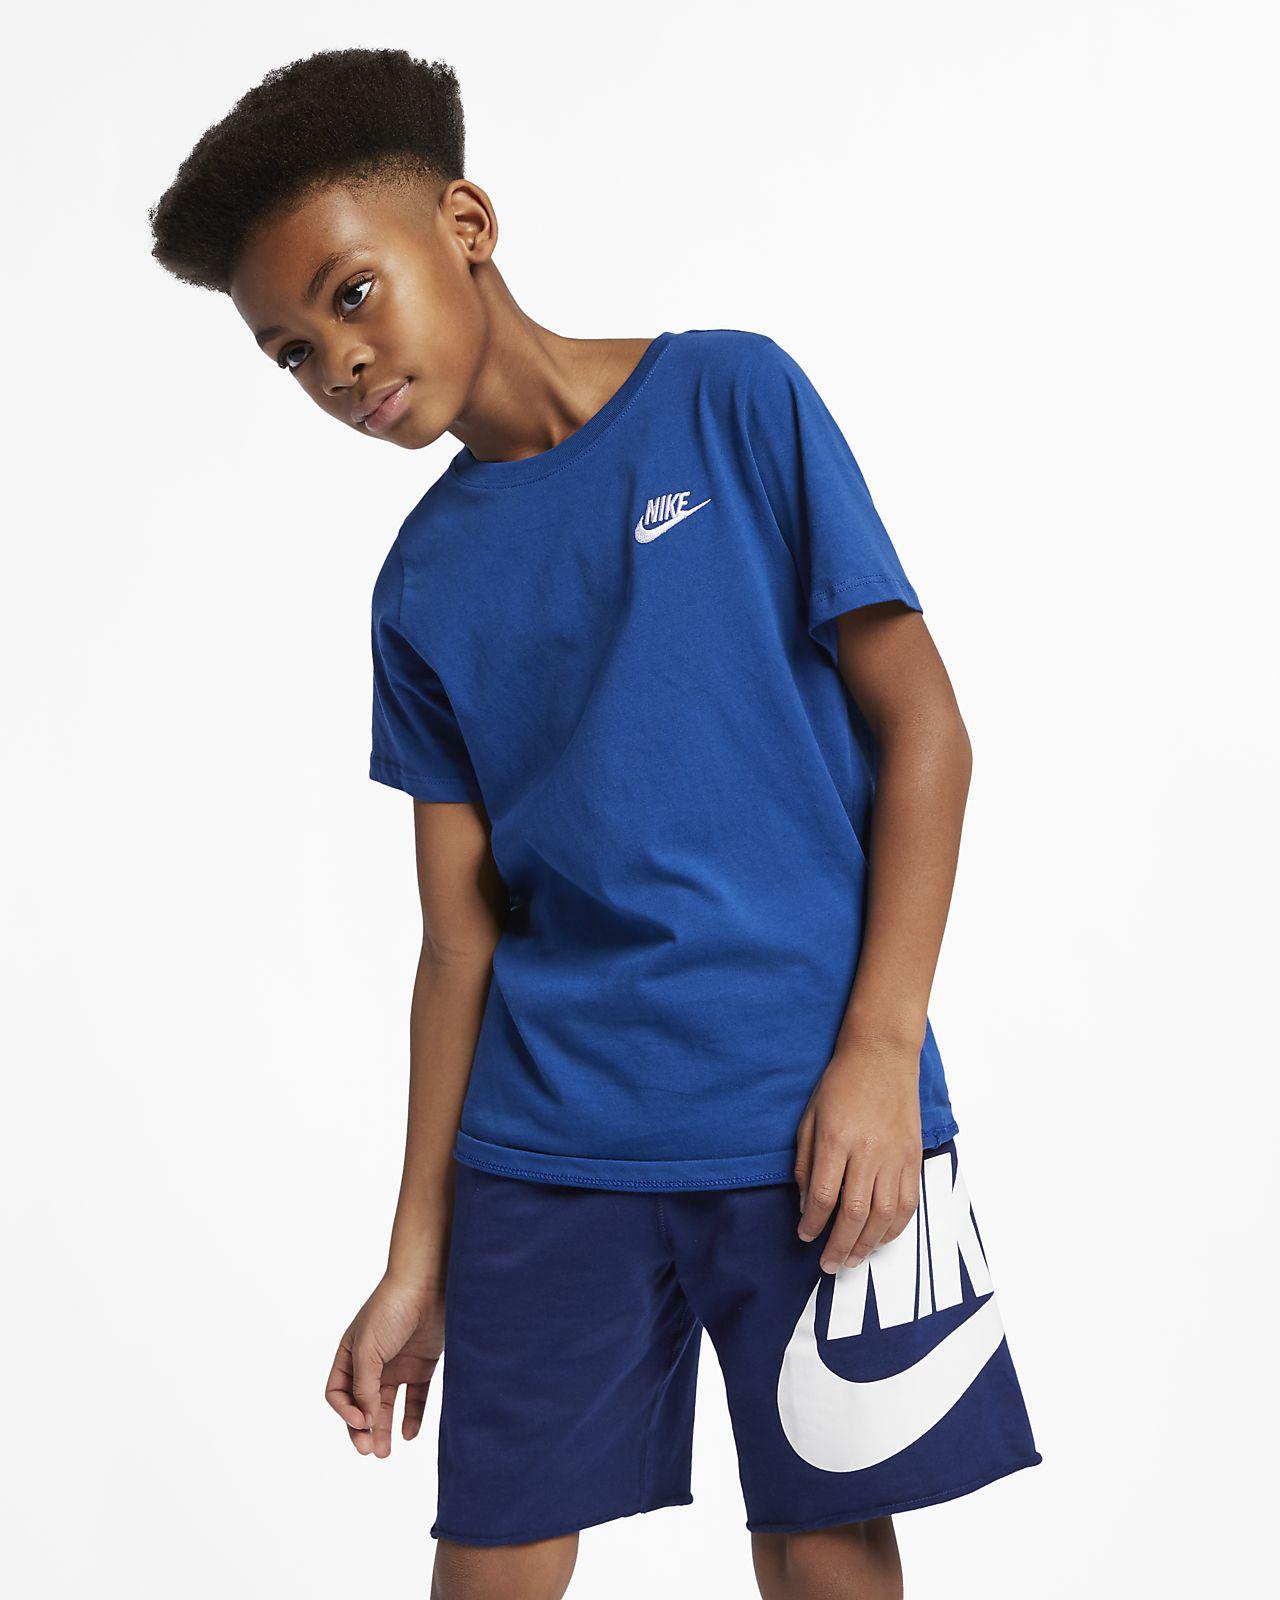 Nike Futura Logo Older Kids  (Boys ) T-Shirt. Nike.com GB 60cd4484d7